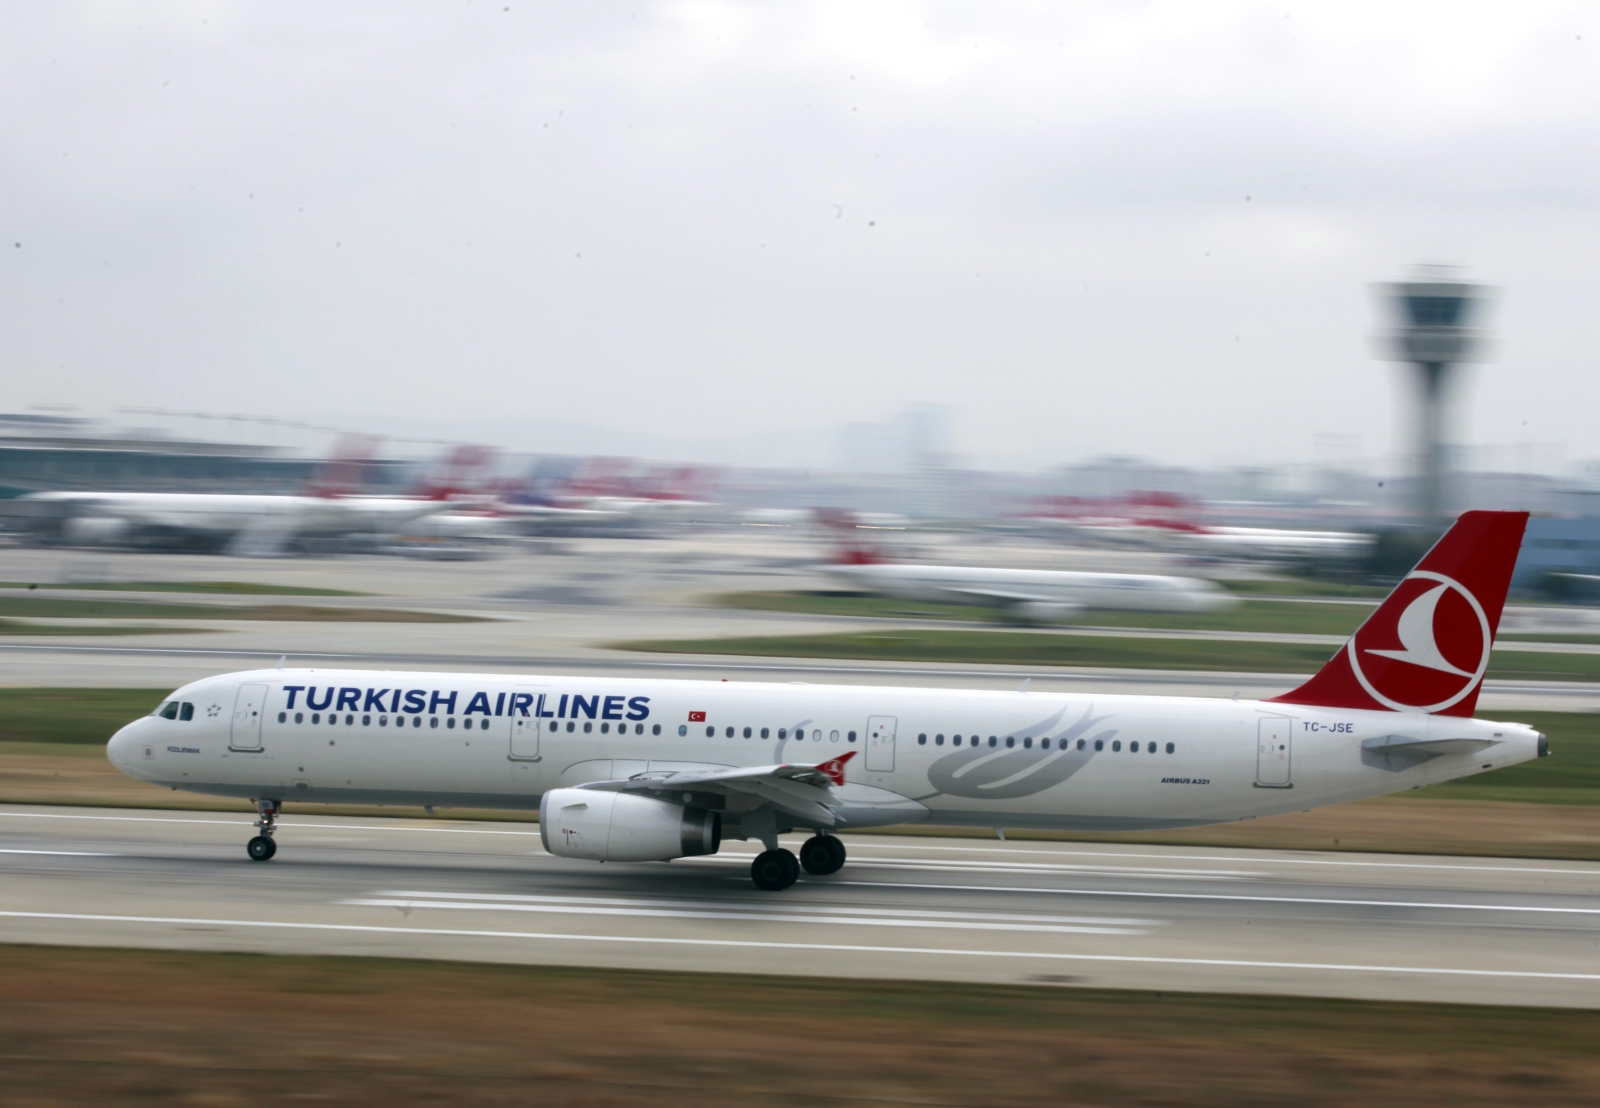 Turkish Airlines emergency landing in Delhi